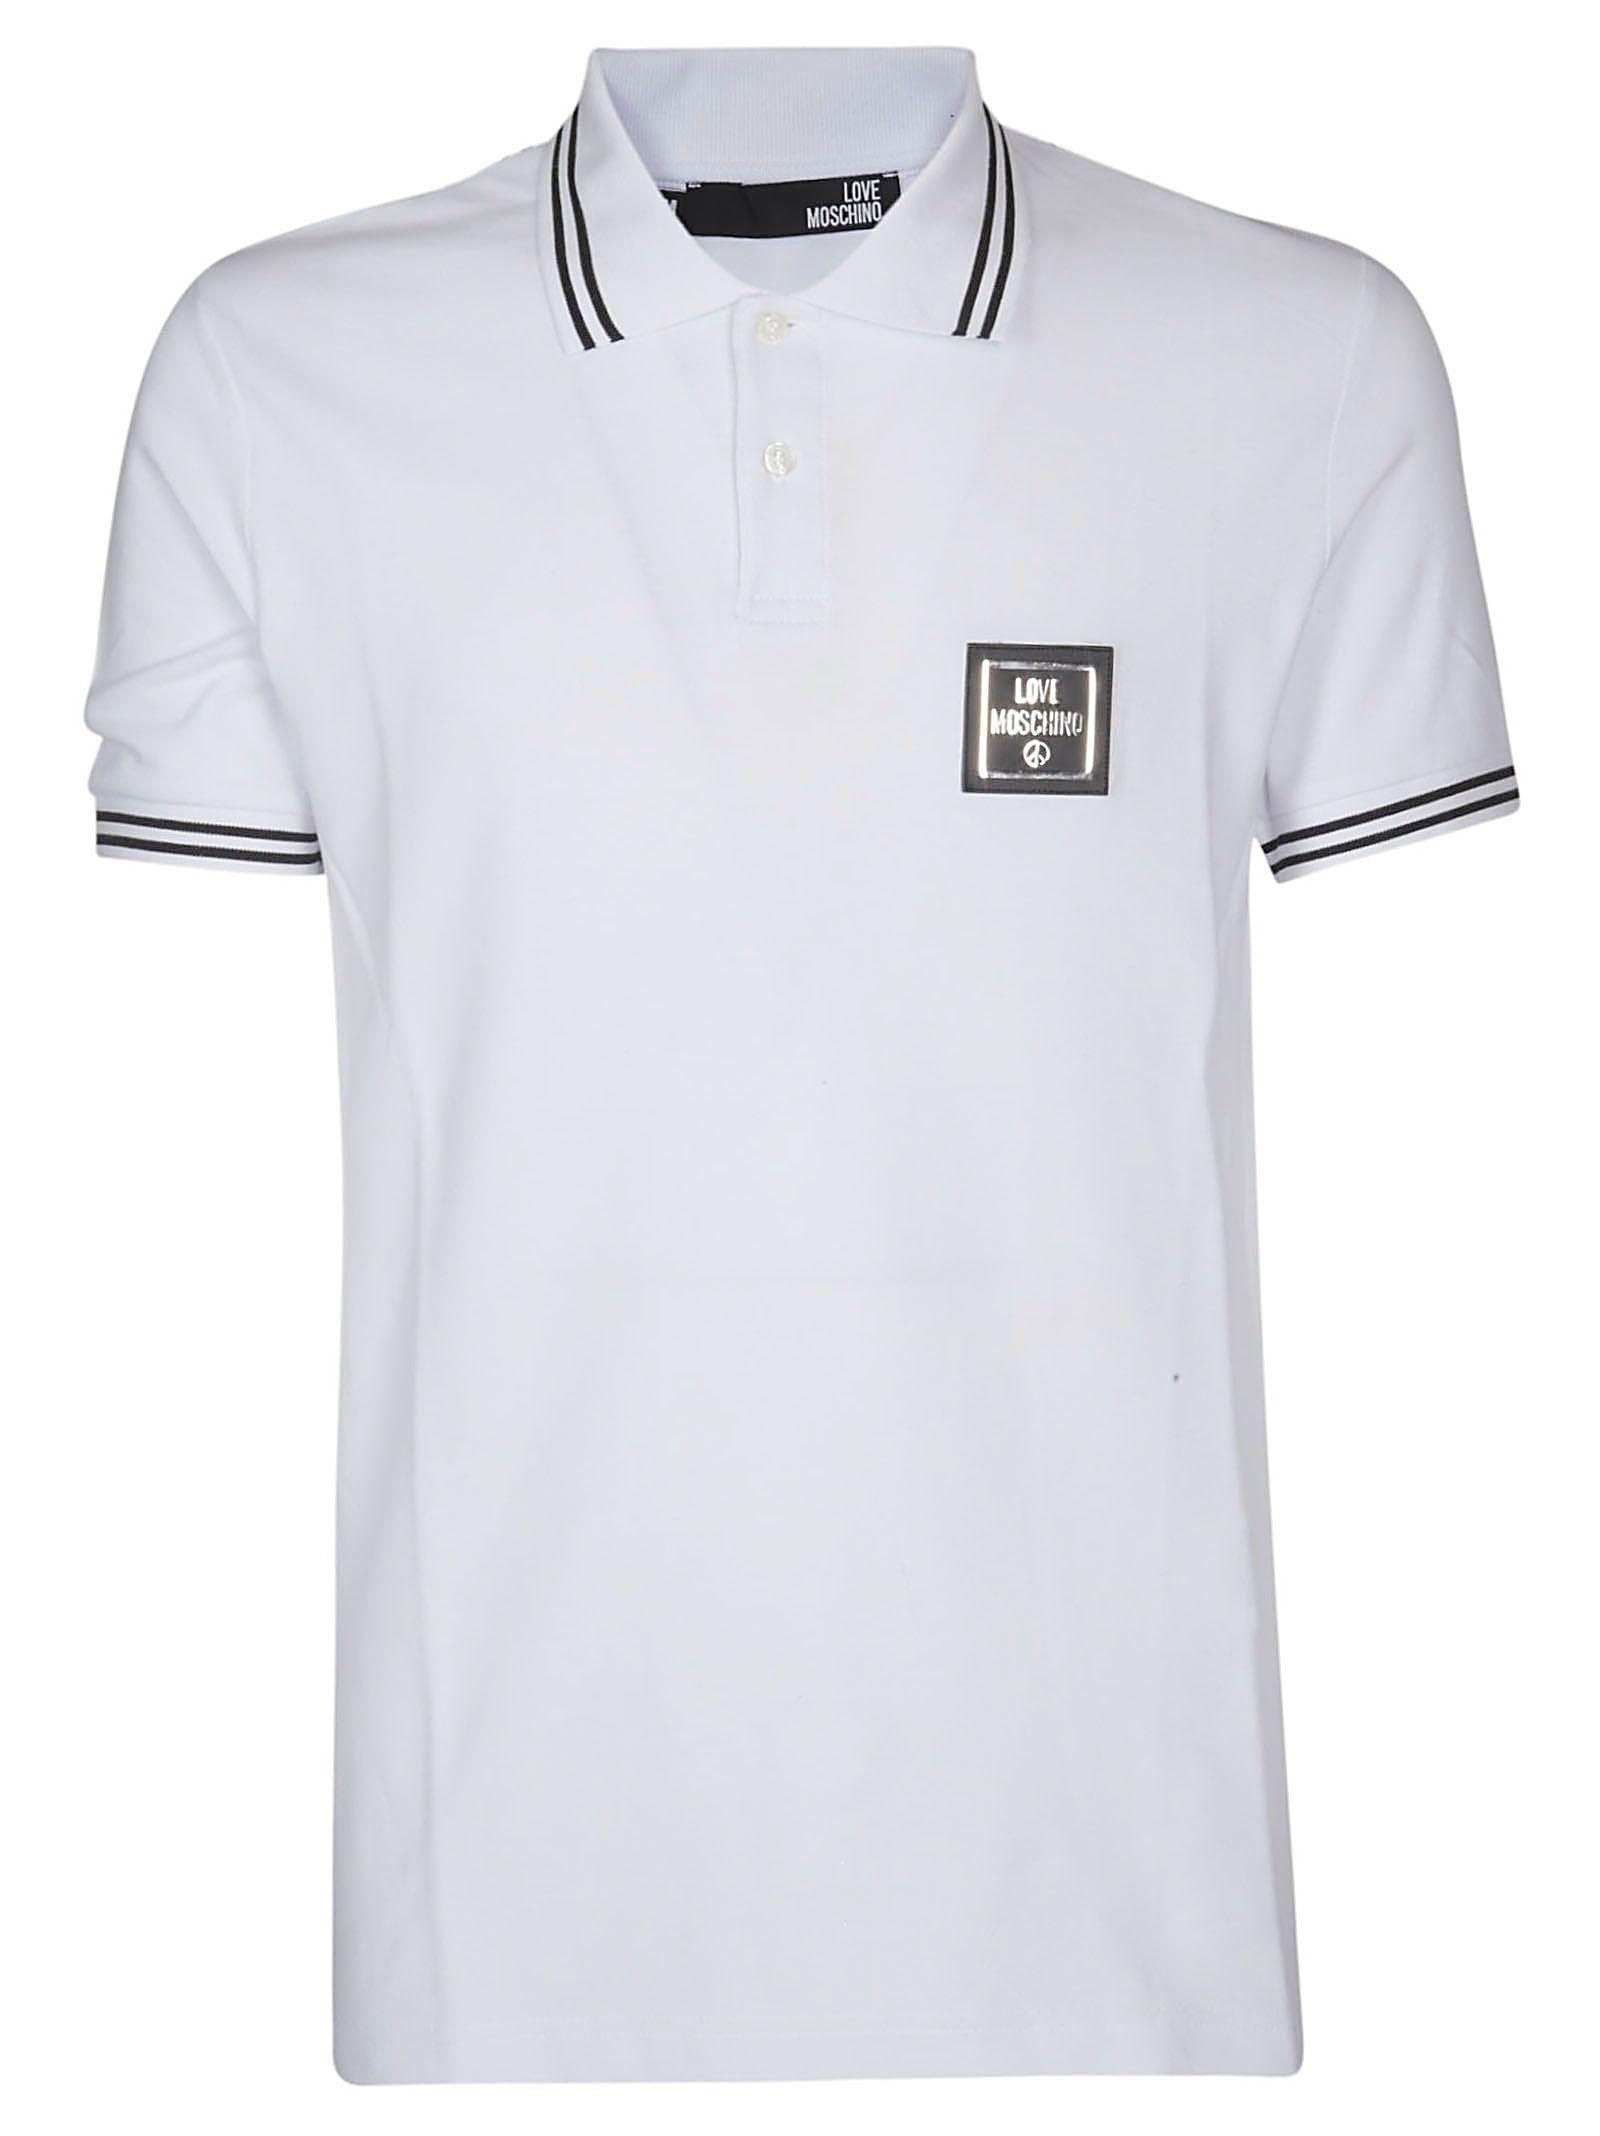 ad4b2638e Love Moschino Love Moschino Logo Patch Polo Shirt - White - 10936883 ...